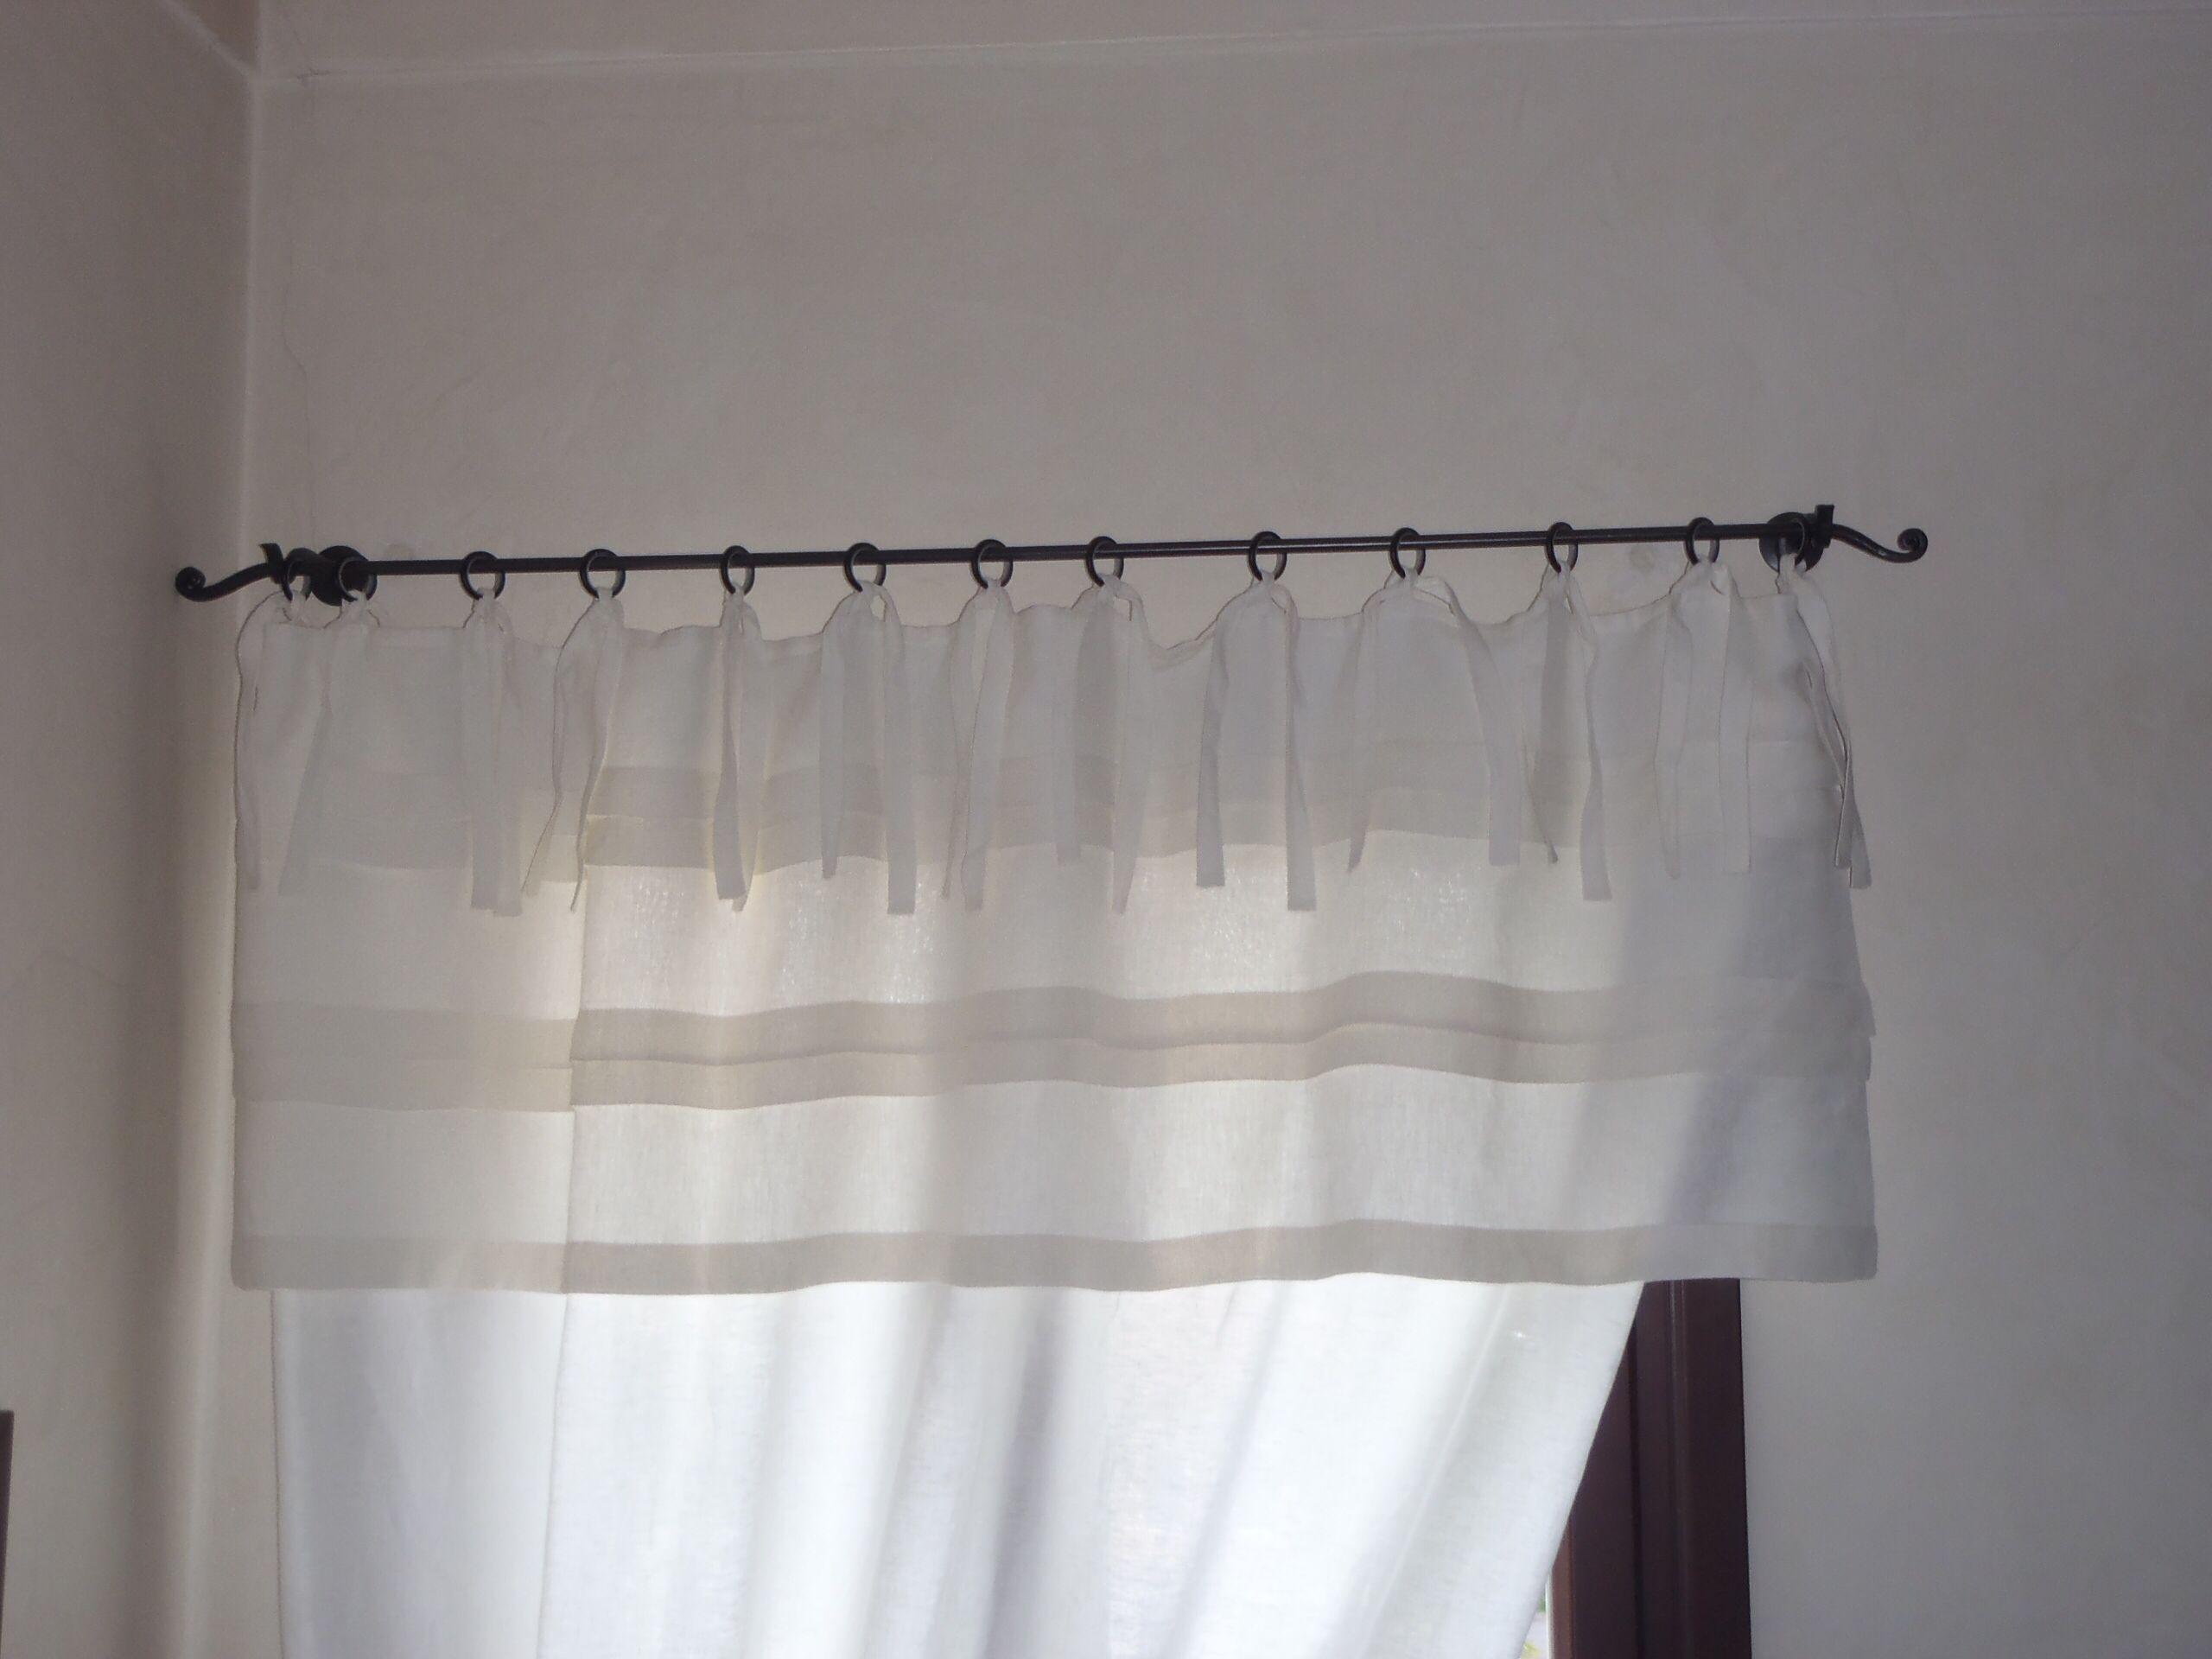 Mantovane Bagno ~ Mantovana per tenda a balze in puro lino tessuti e tendaggi